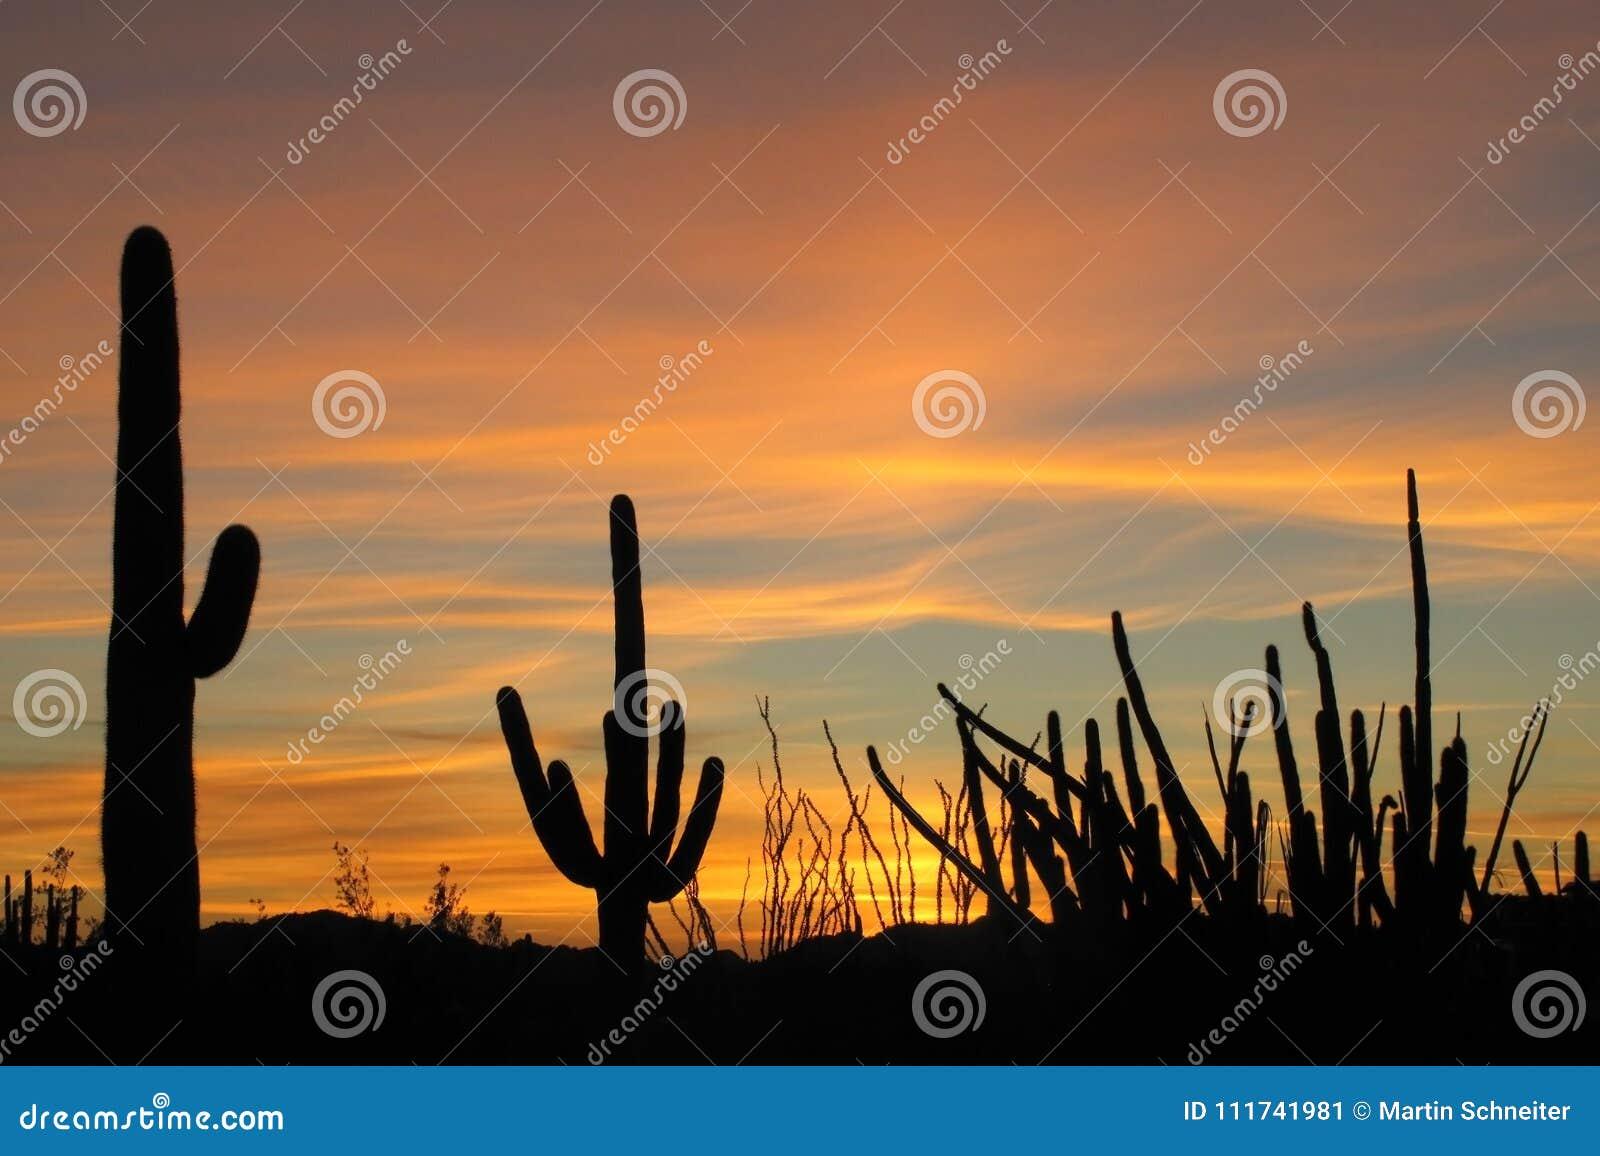 Saguaro, Organowej drymby i Ocotillo kaktusy przy zmierzchem w Organowej drymby Kaktusowym Krajowym zabytku, Arizona, usa